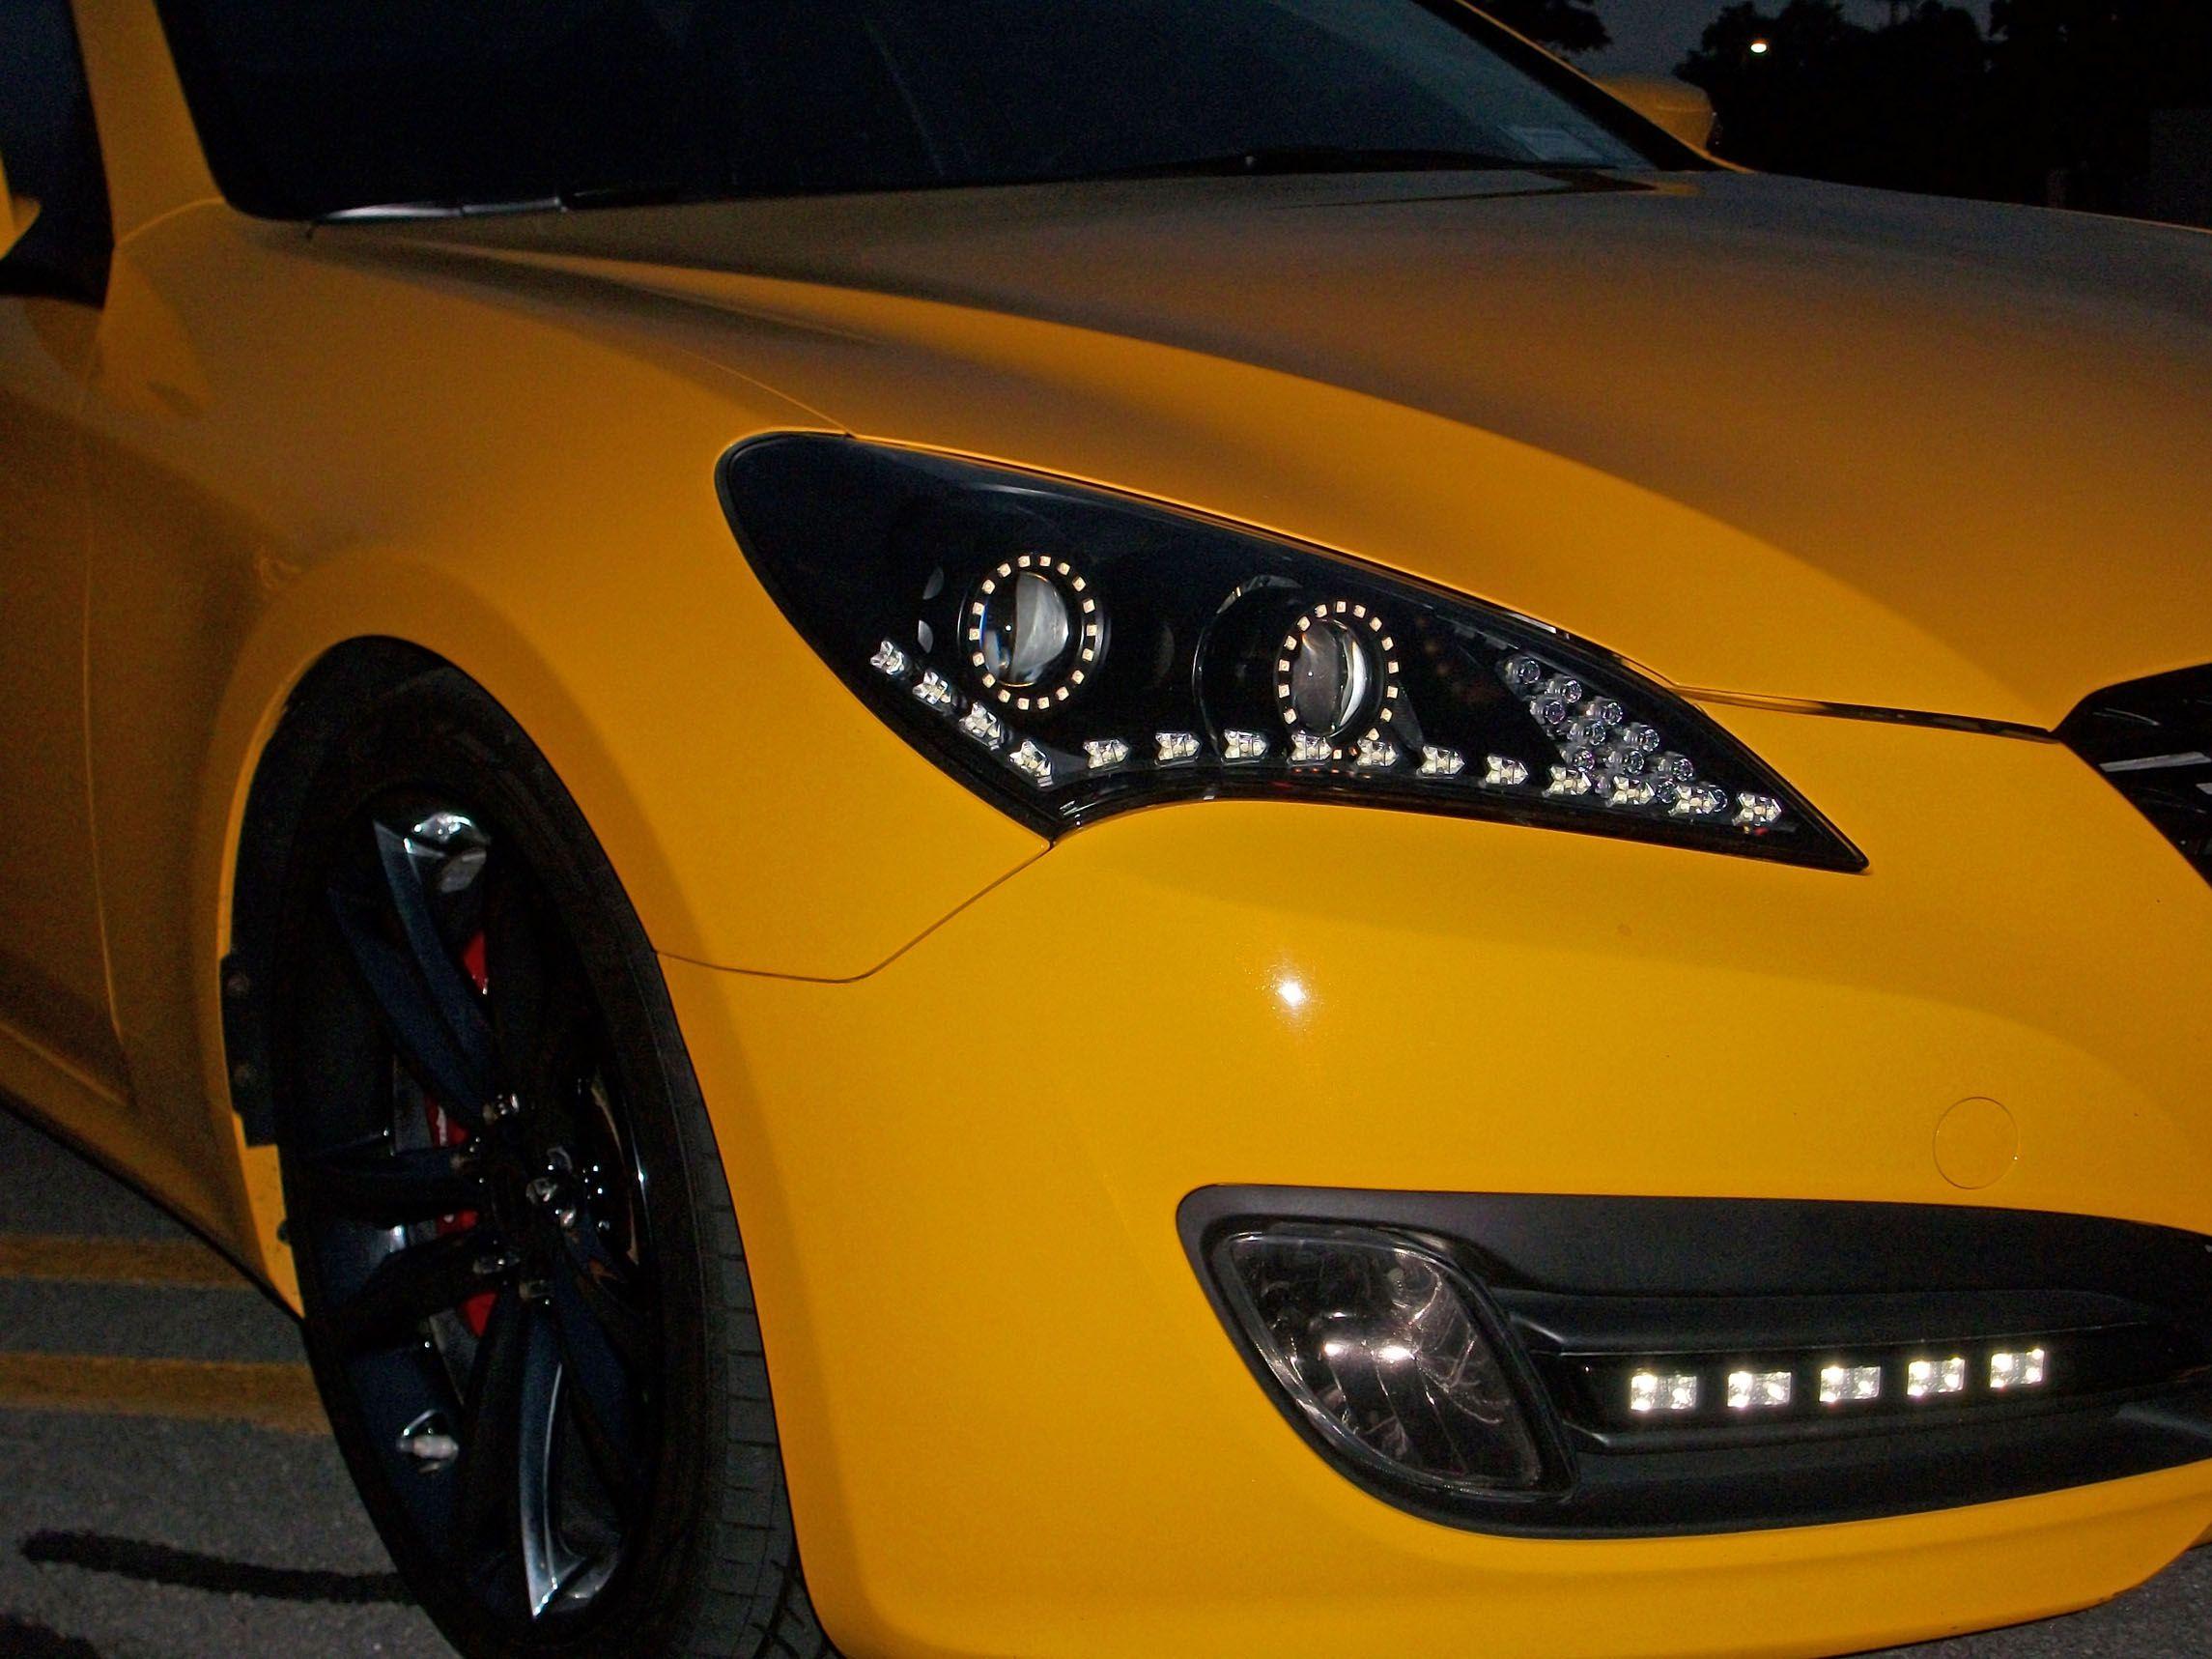 Dennis Genesis Coupe Dual Projector Led Headlights By Flyryde Hyundai Genesis Coupe Coupe Hyundai Genesis